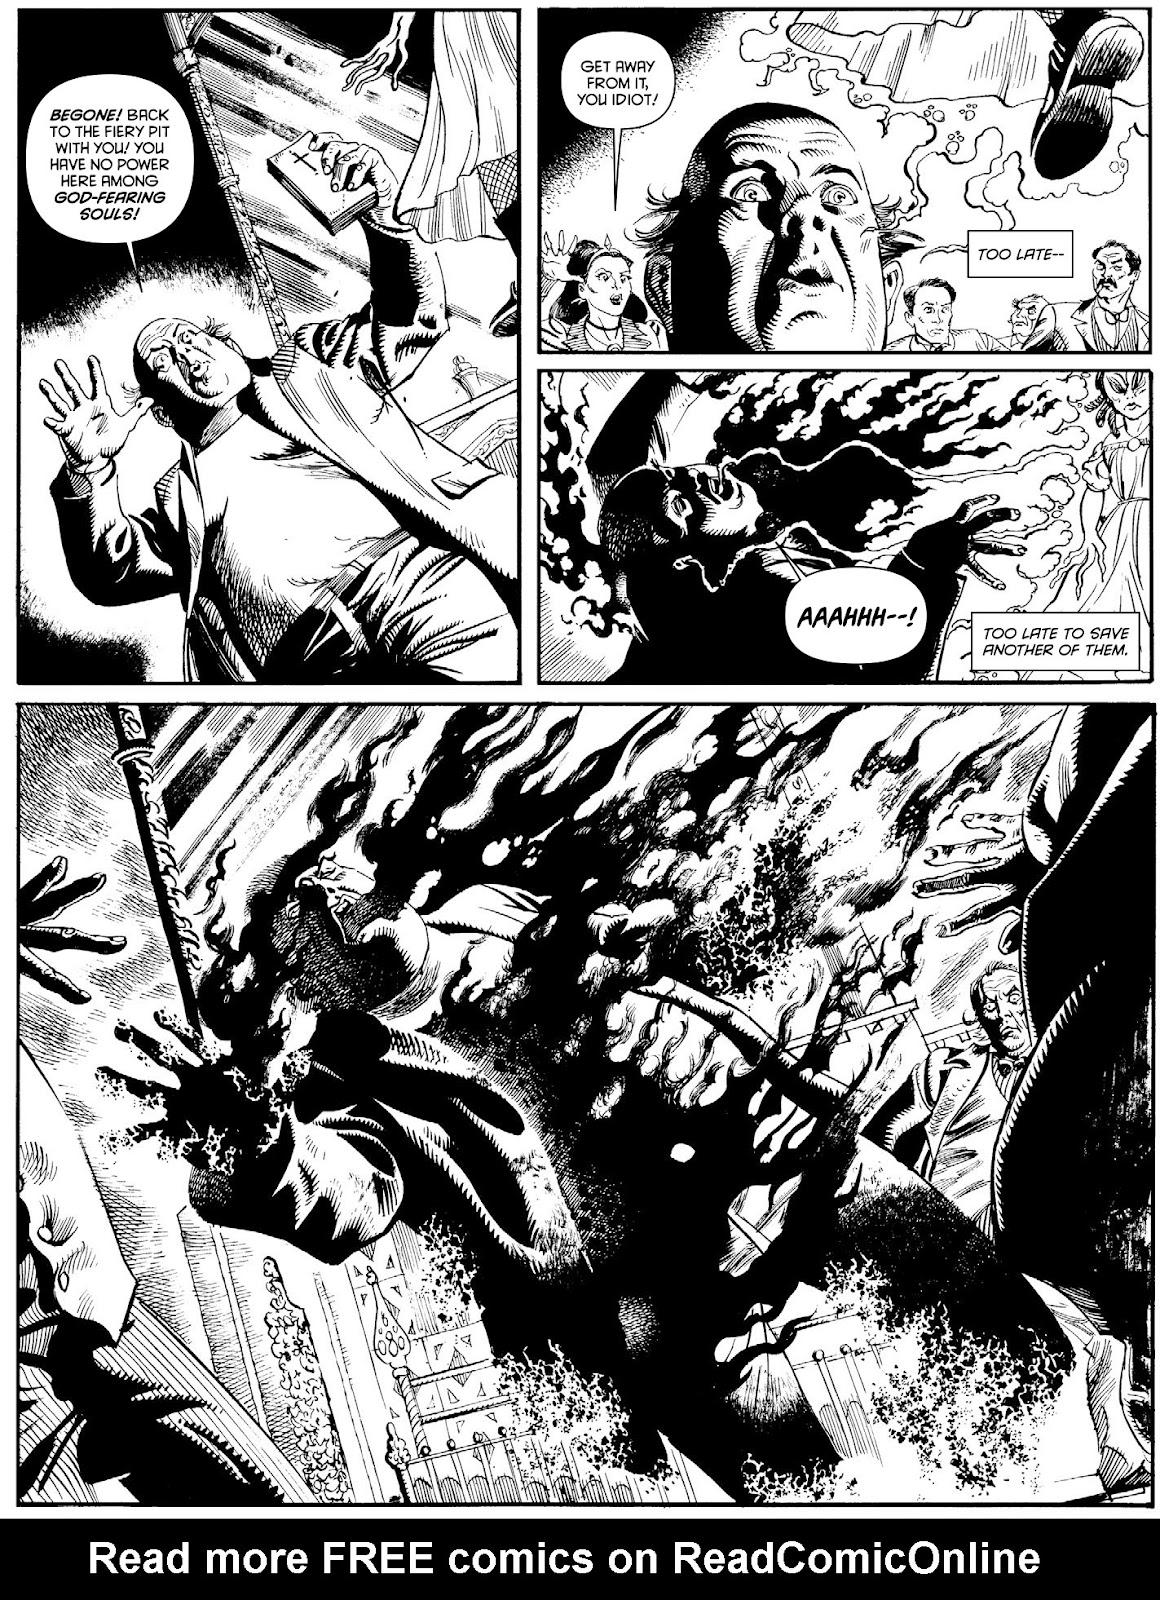 Judge Dredd Megazine (Vol. 5) issue 427 - Page 92